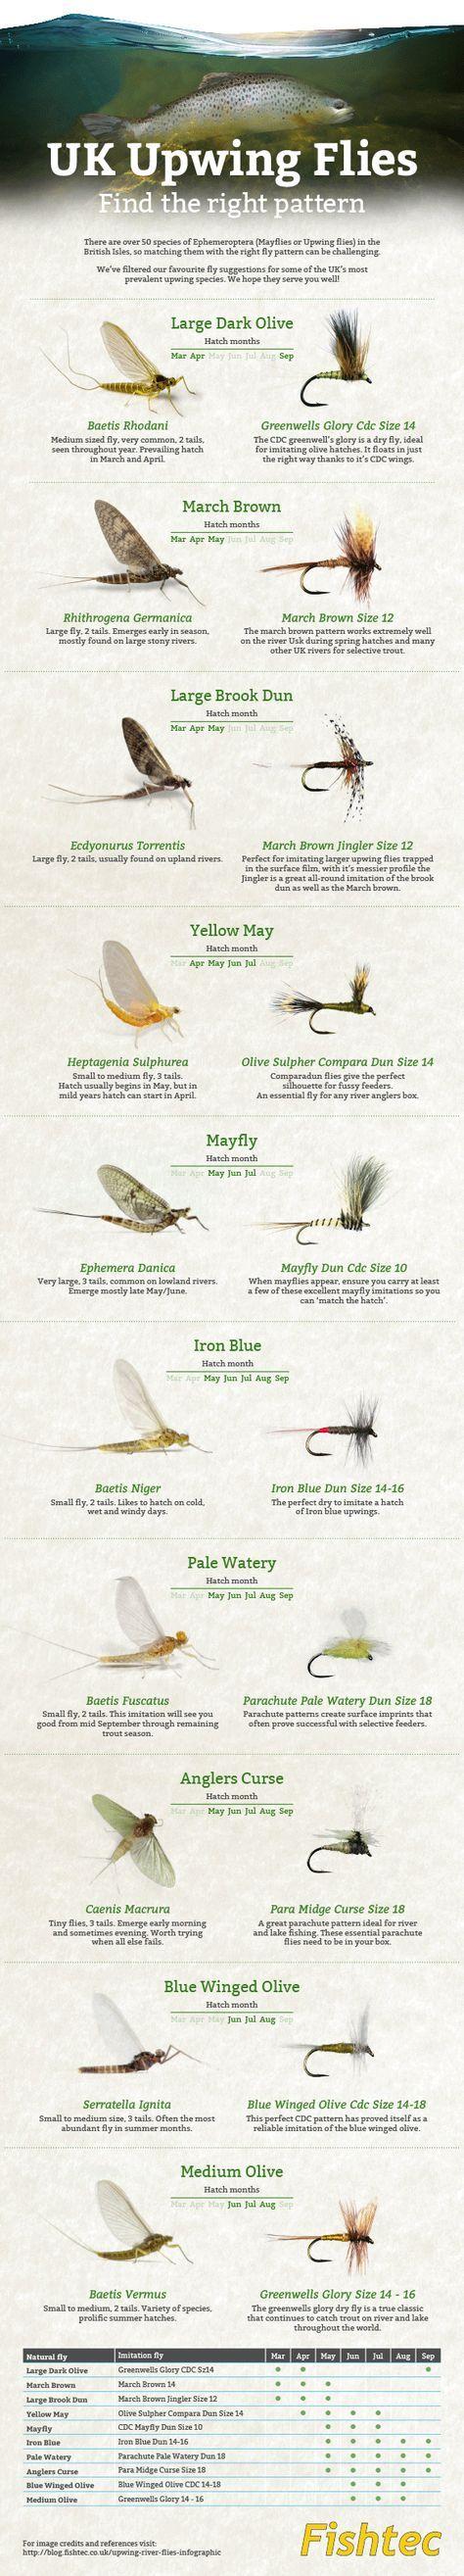 Fly fishing infographic upwing flies uk